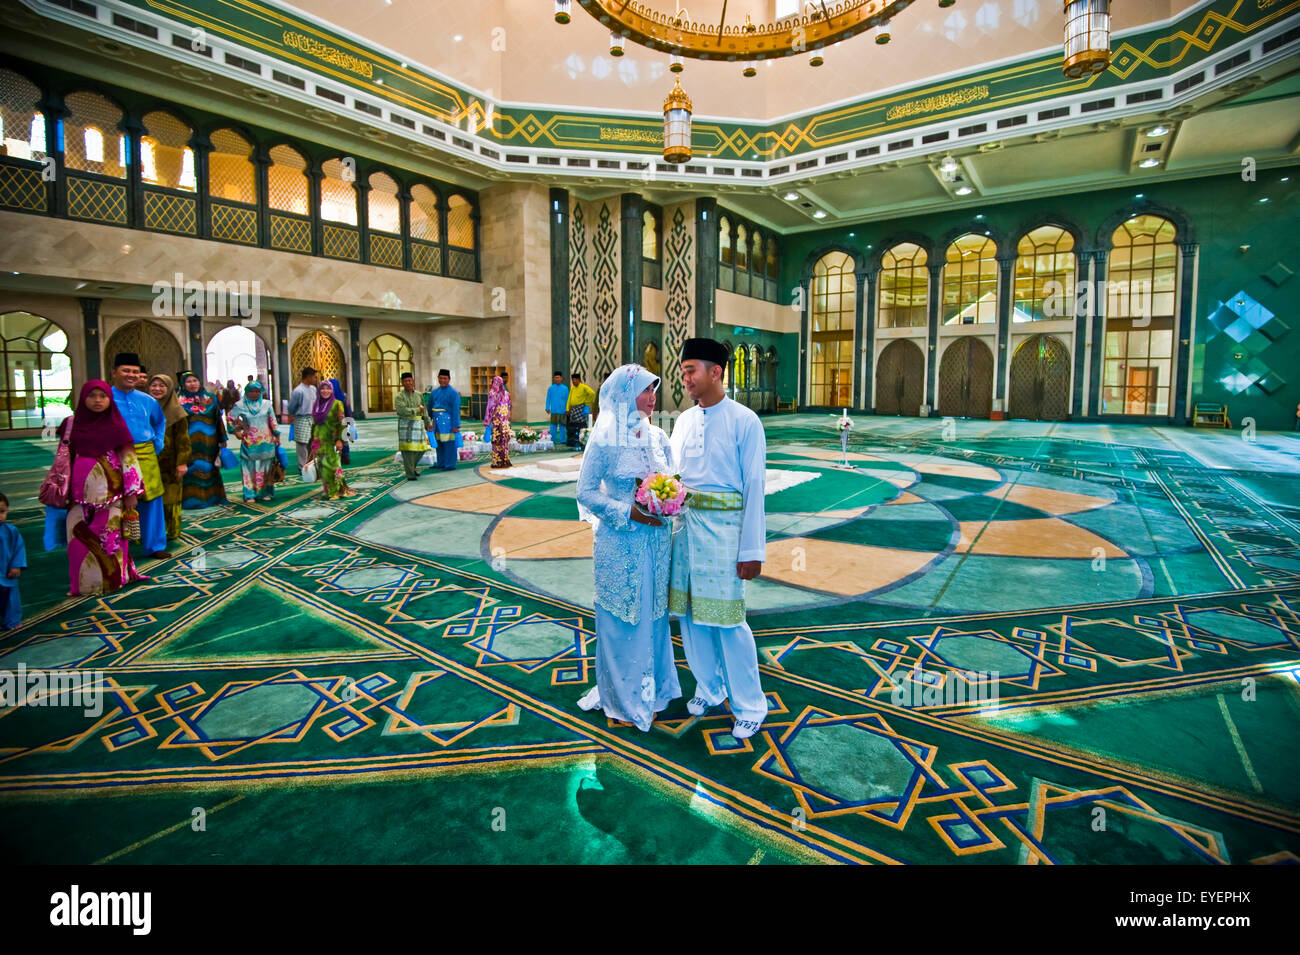 Wedding inside Jame'Asr Hassanil Bolkiah Mosque; Bandar Seri Begawan, Brunei - Stock Image